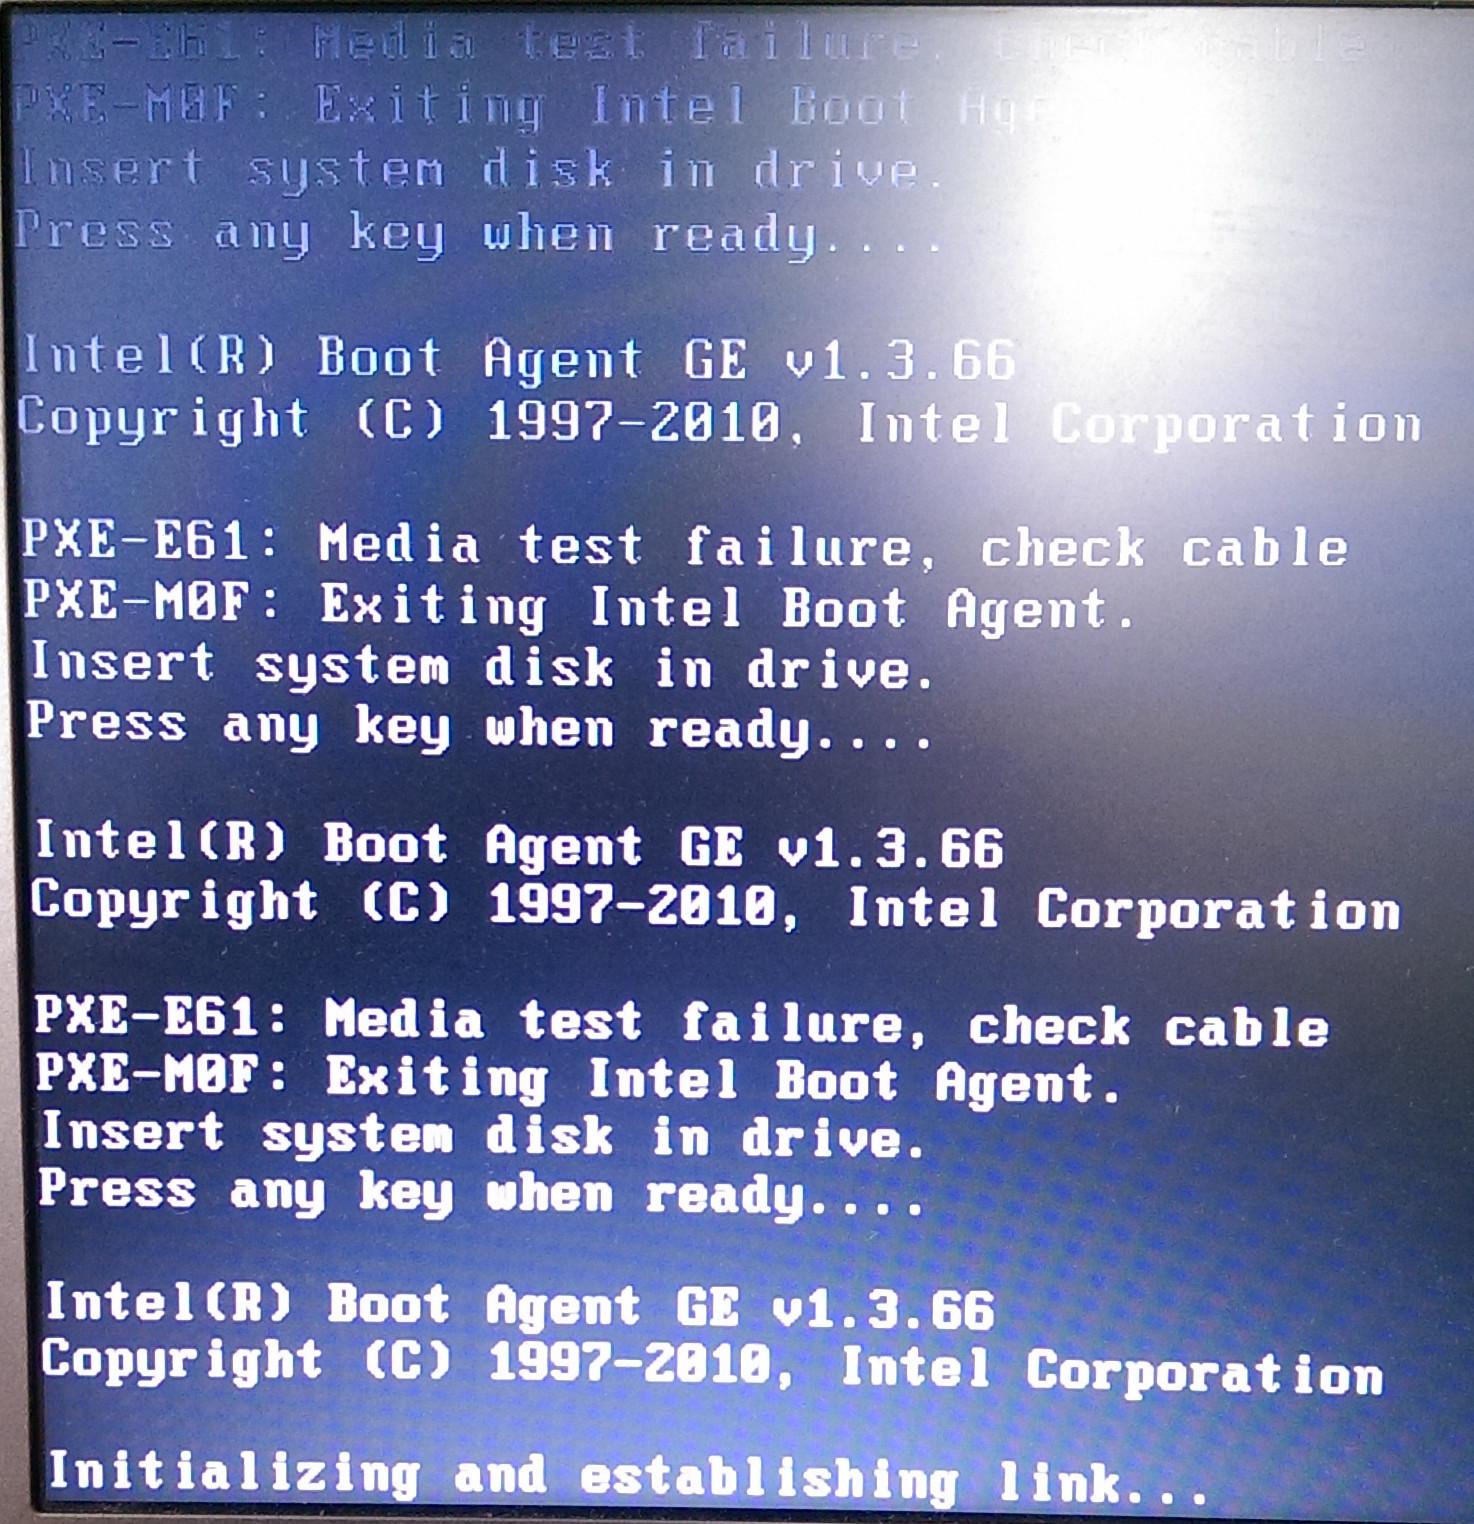 TOSHIBA Portege Z830 - Intel Boot Agent GE - elektroda pl